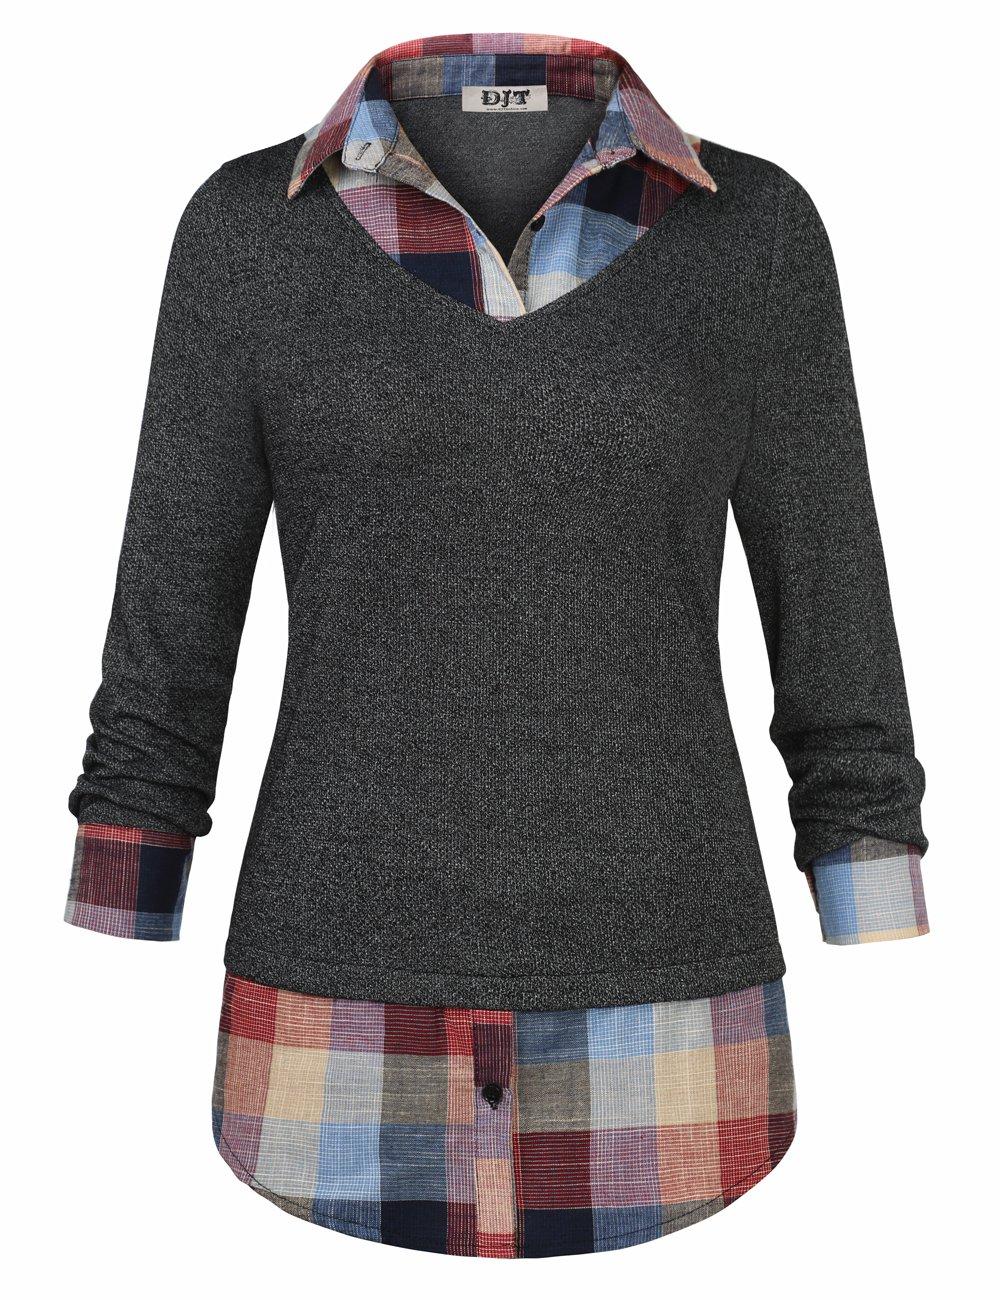 Women's 2-in-1 Style Shirt, DJT Plaid Lapel Collar Curved Hem Checker Pullover Sweatshirt T-Shirt Top M Dark Grey